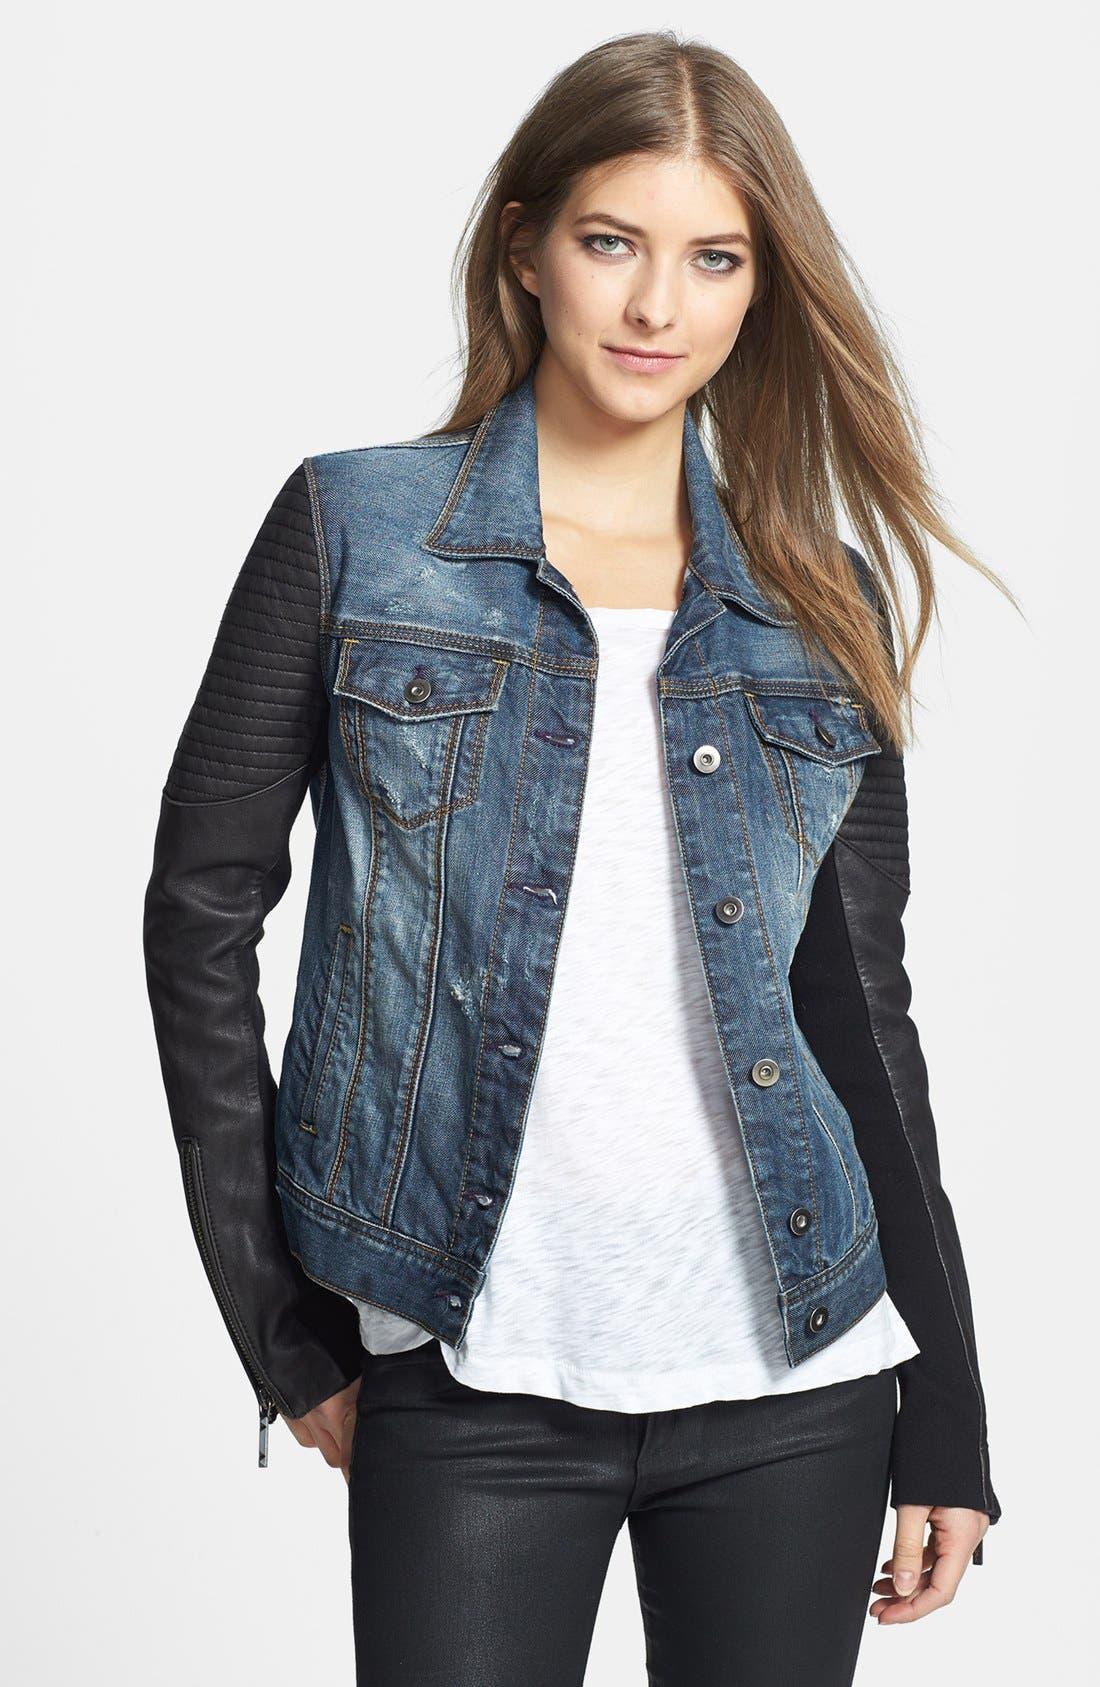 Alternate Image 1 Selected - BCBGMAXAZRIA 'Nikki' Faux Leather Sleeve Denim Jacket